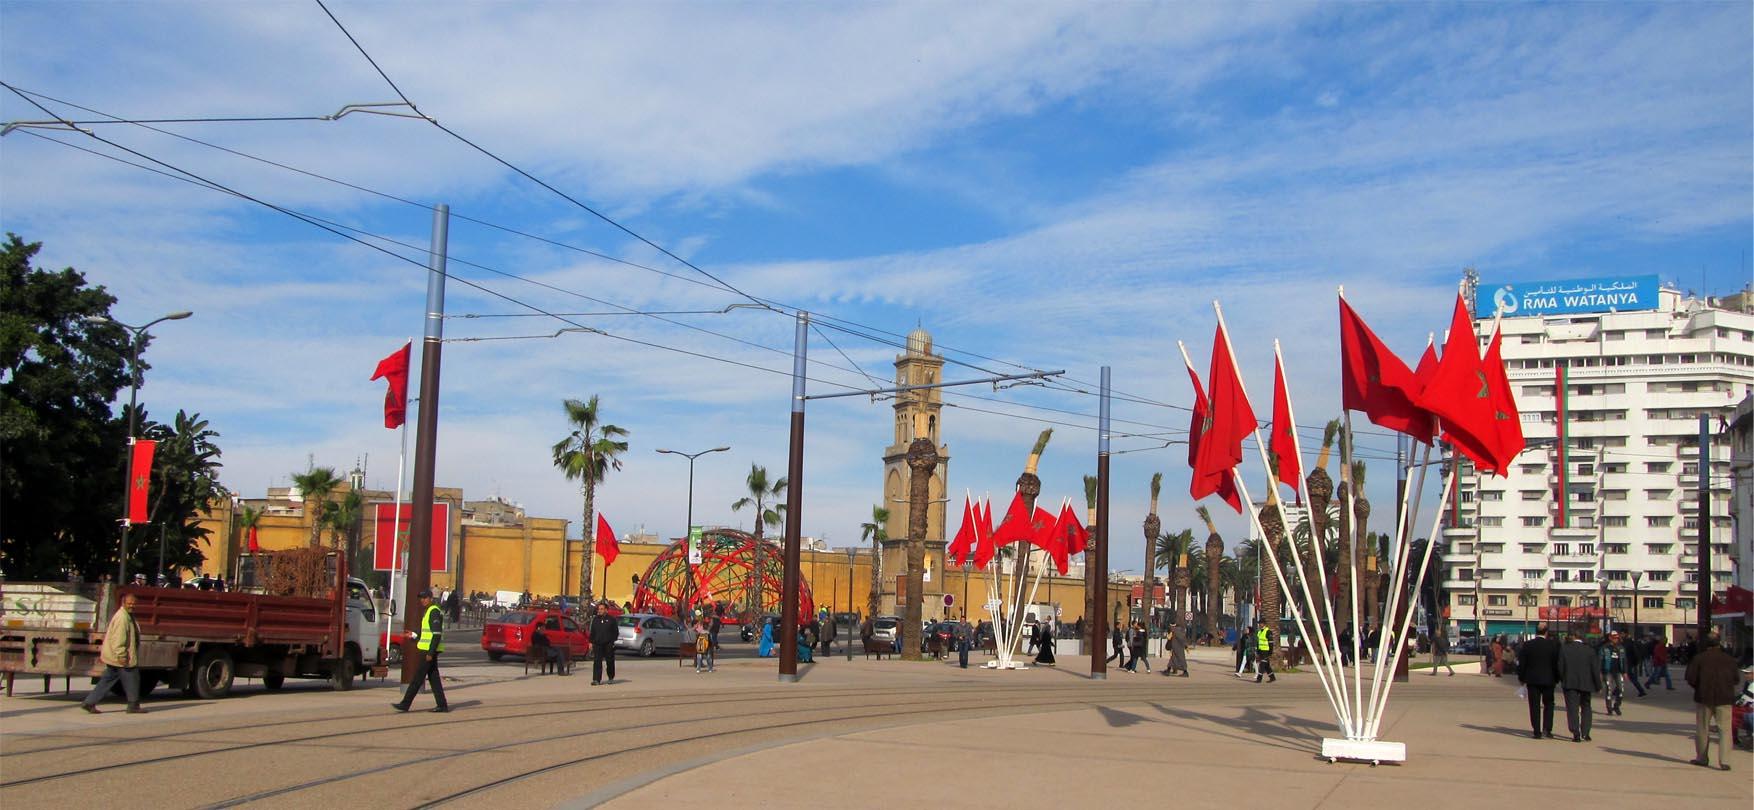 13 maroko kazablanka dolazi kralj